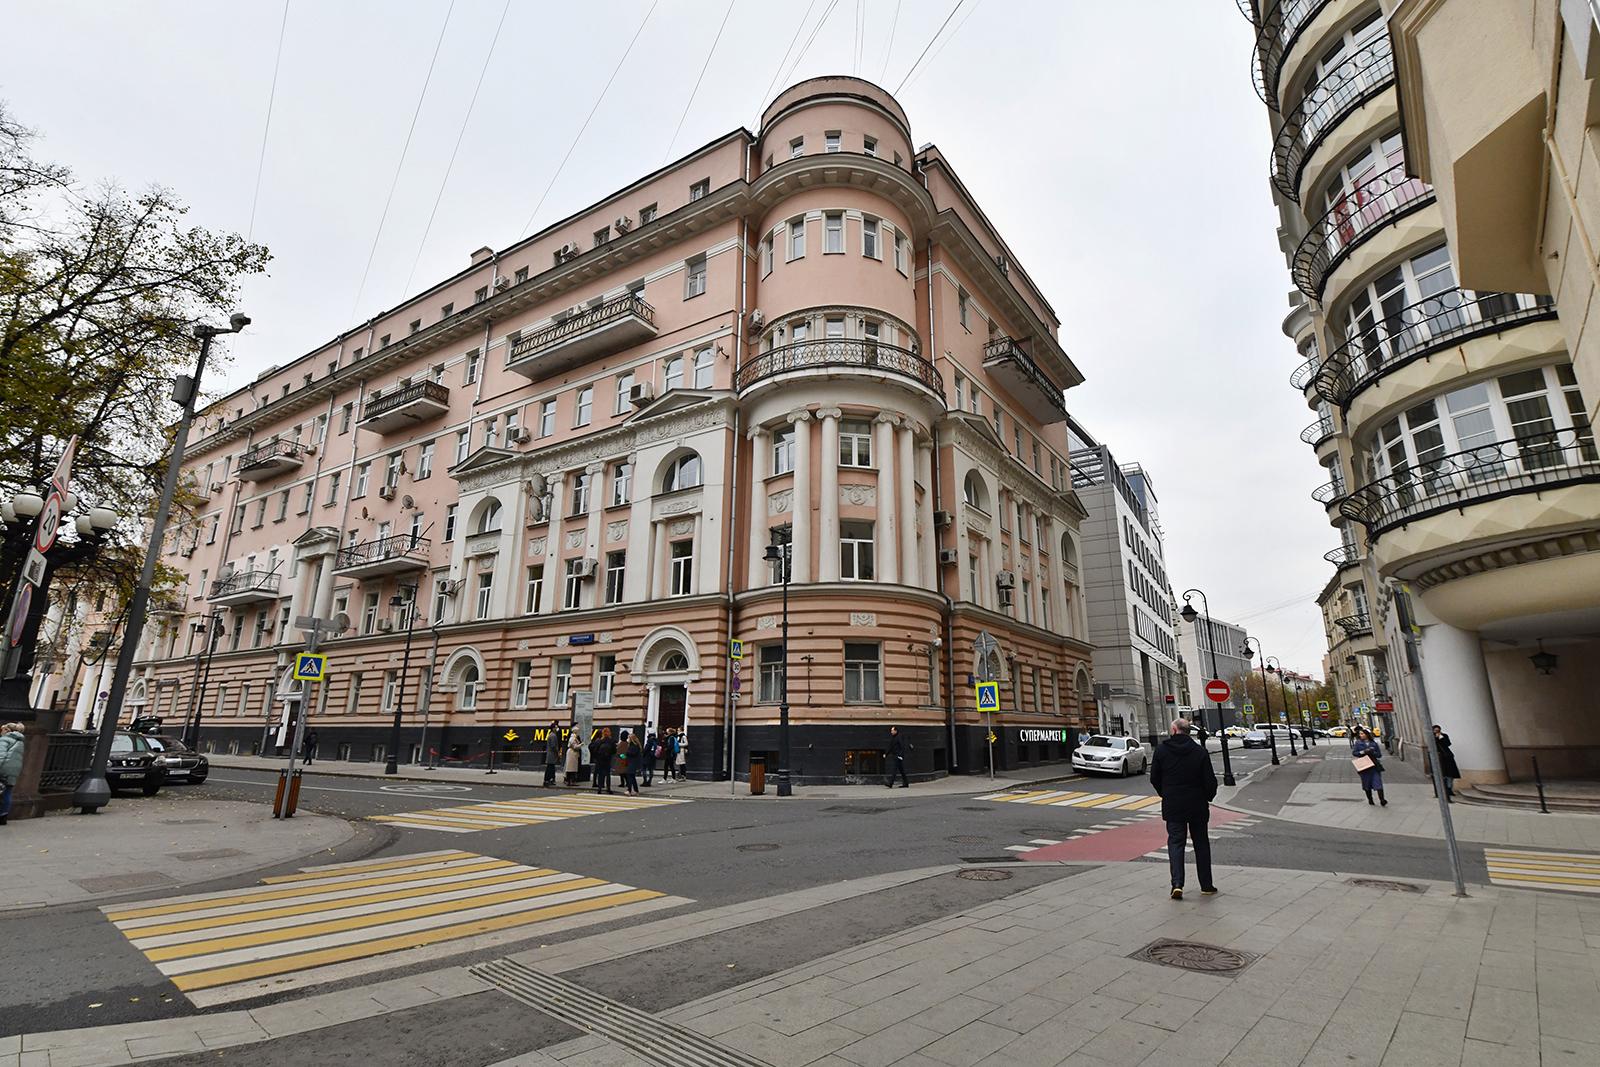 Фасад доходного дома князя Сидамон-Эристова у Патриарших прудов отреставрируют